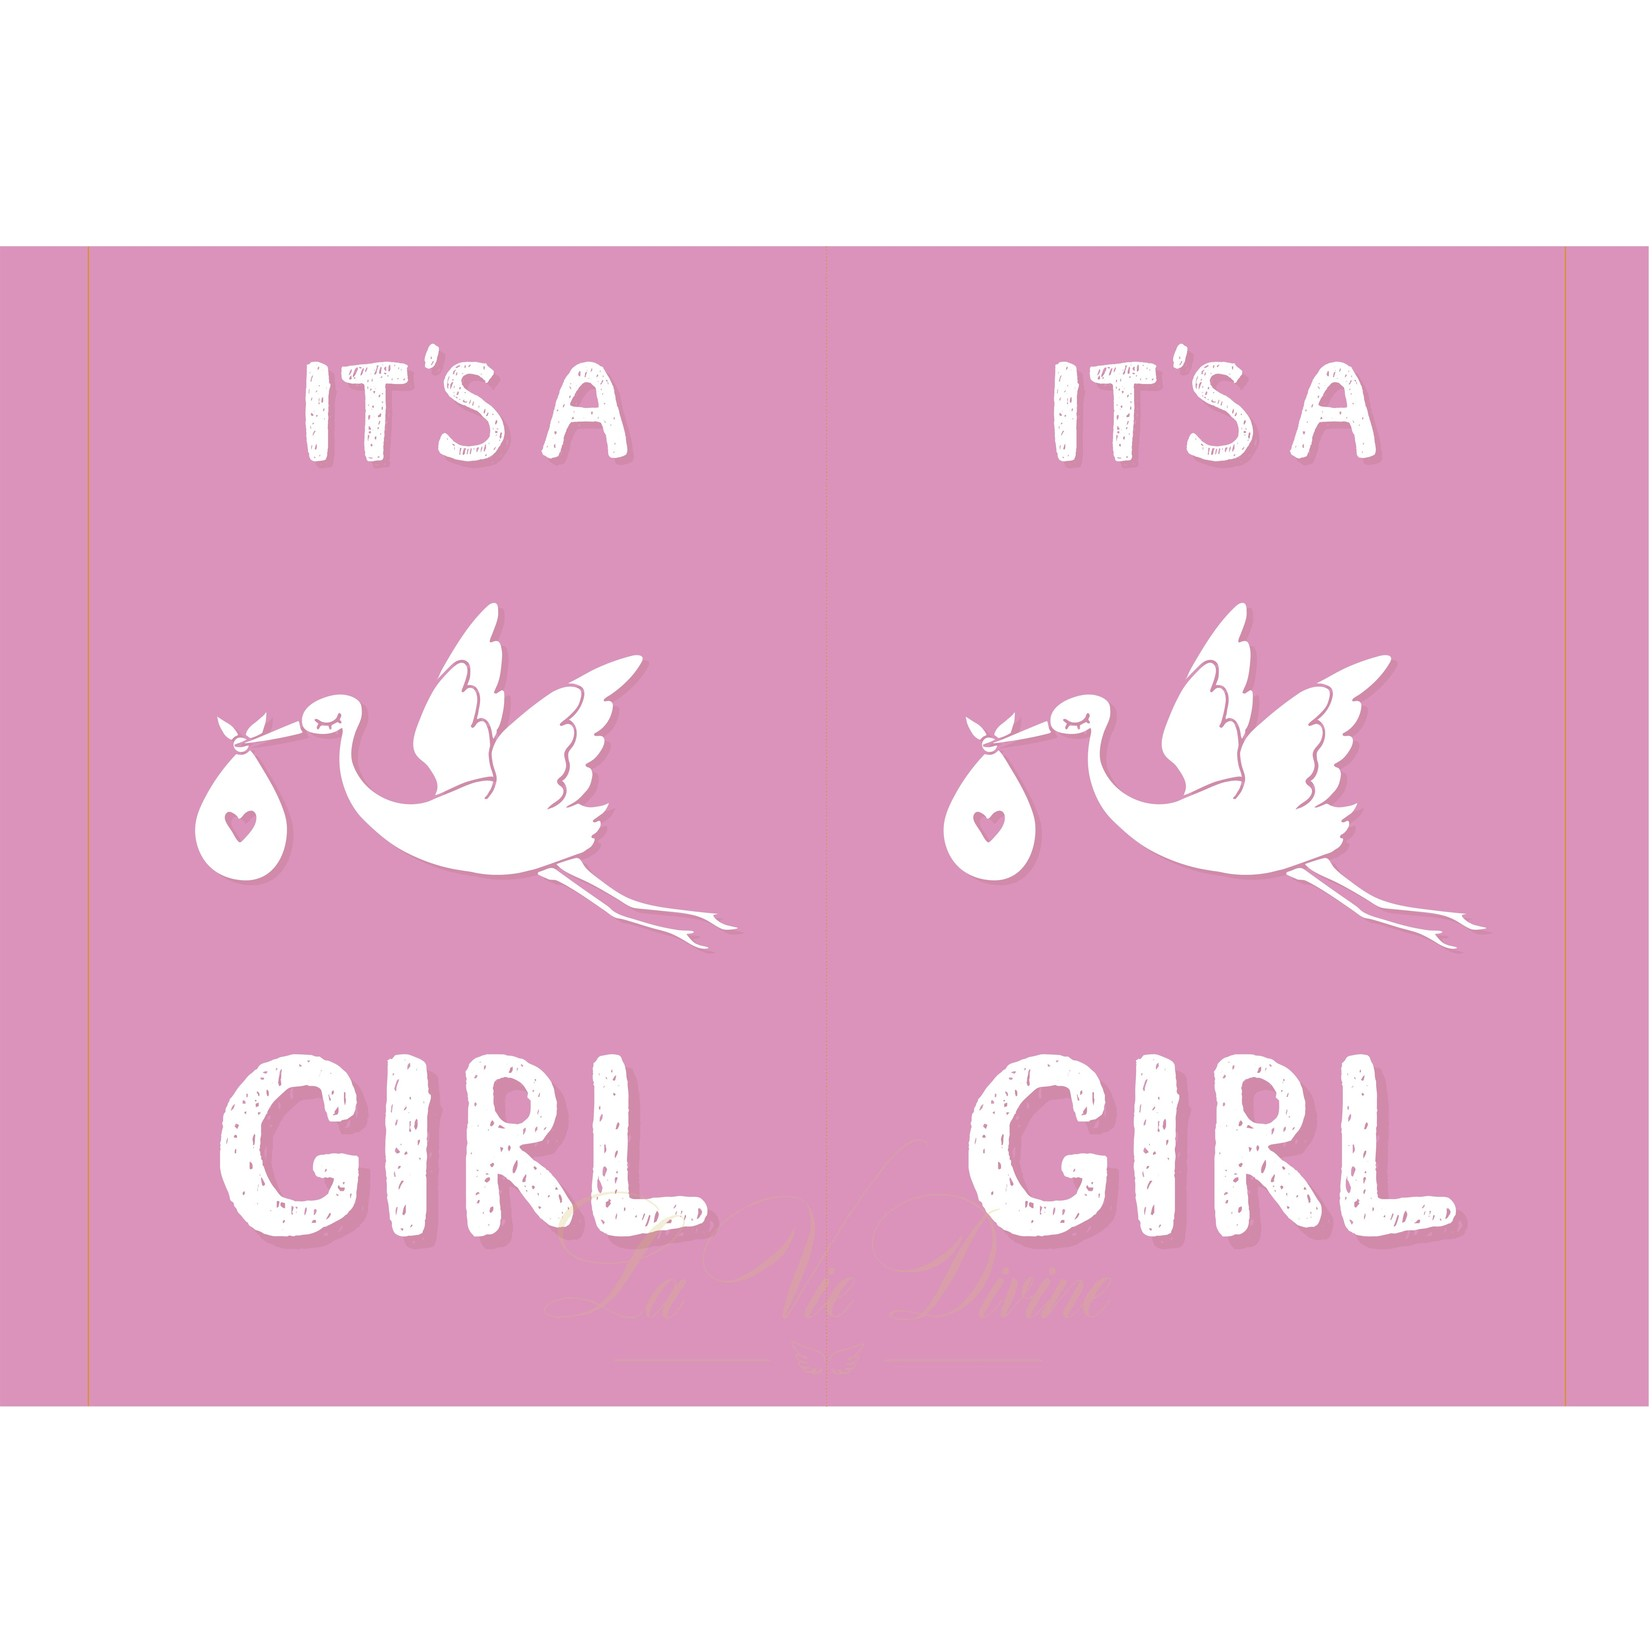 La Vie Divine Geboortebord 'it's a girl' met ooievaar